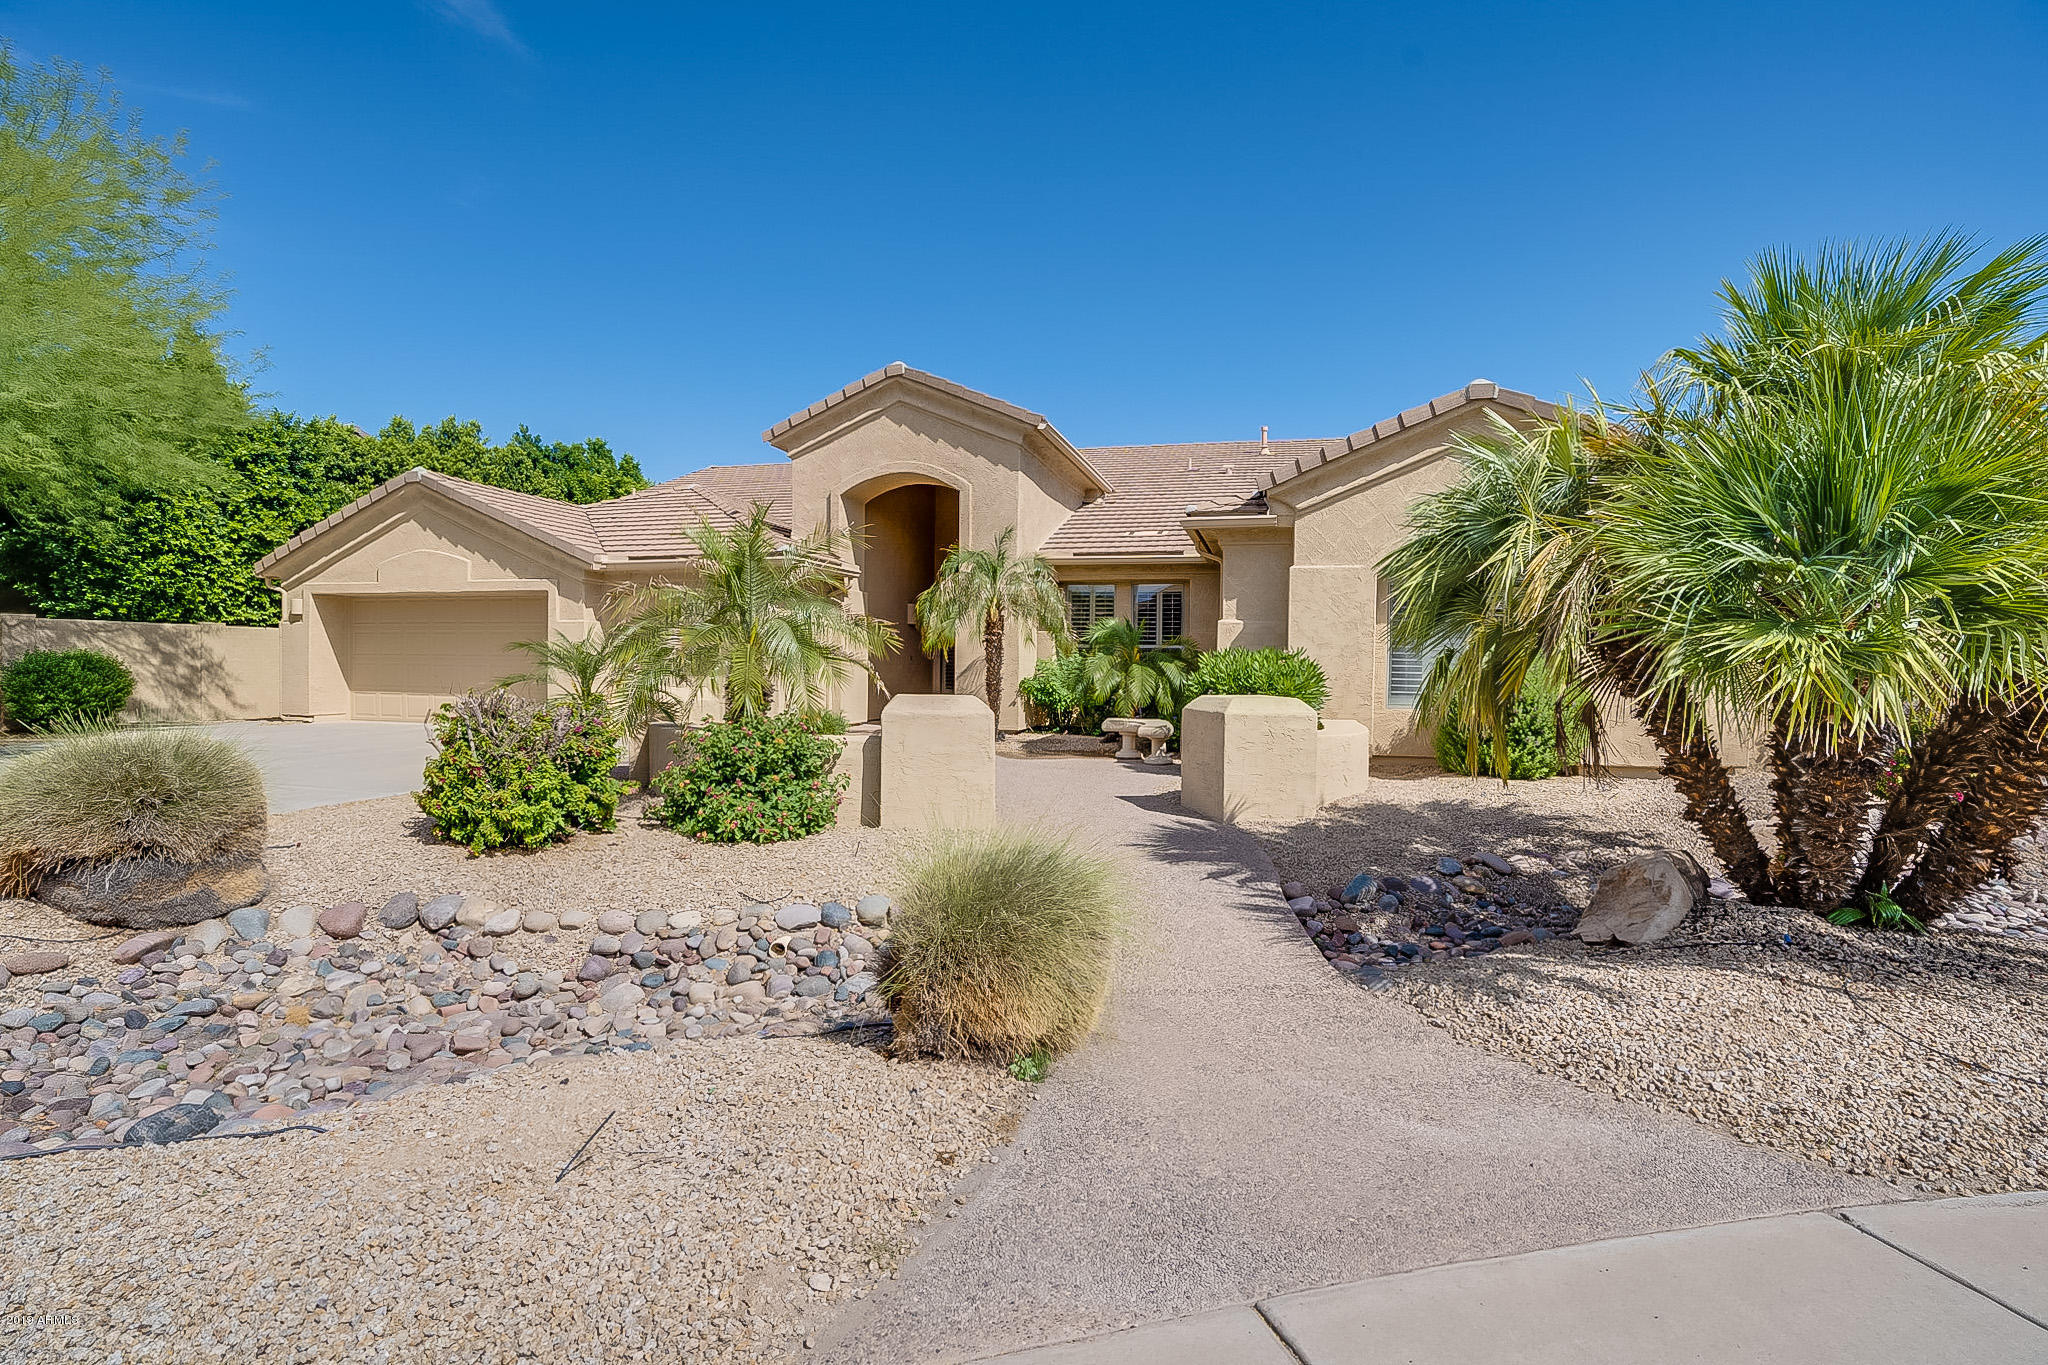 Photo of 1064 W ENFIELD Place, Chandler, AZ 85286